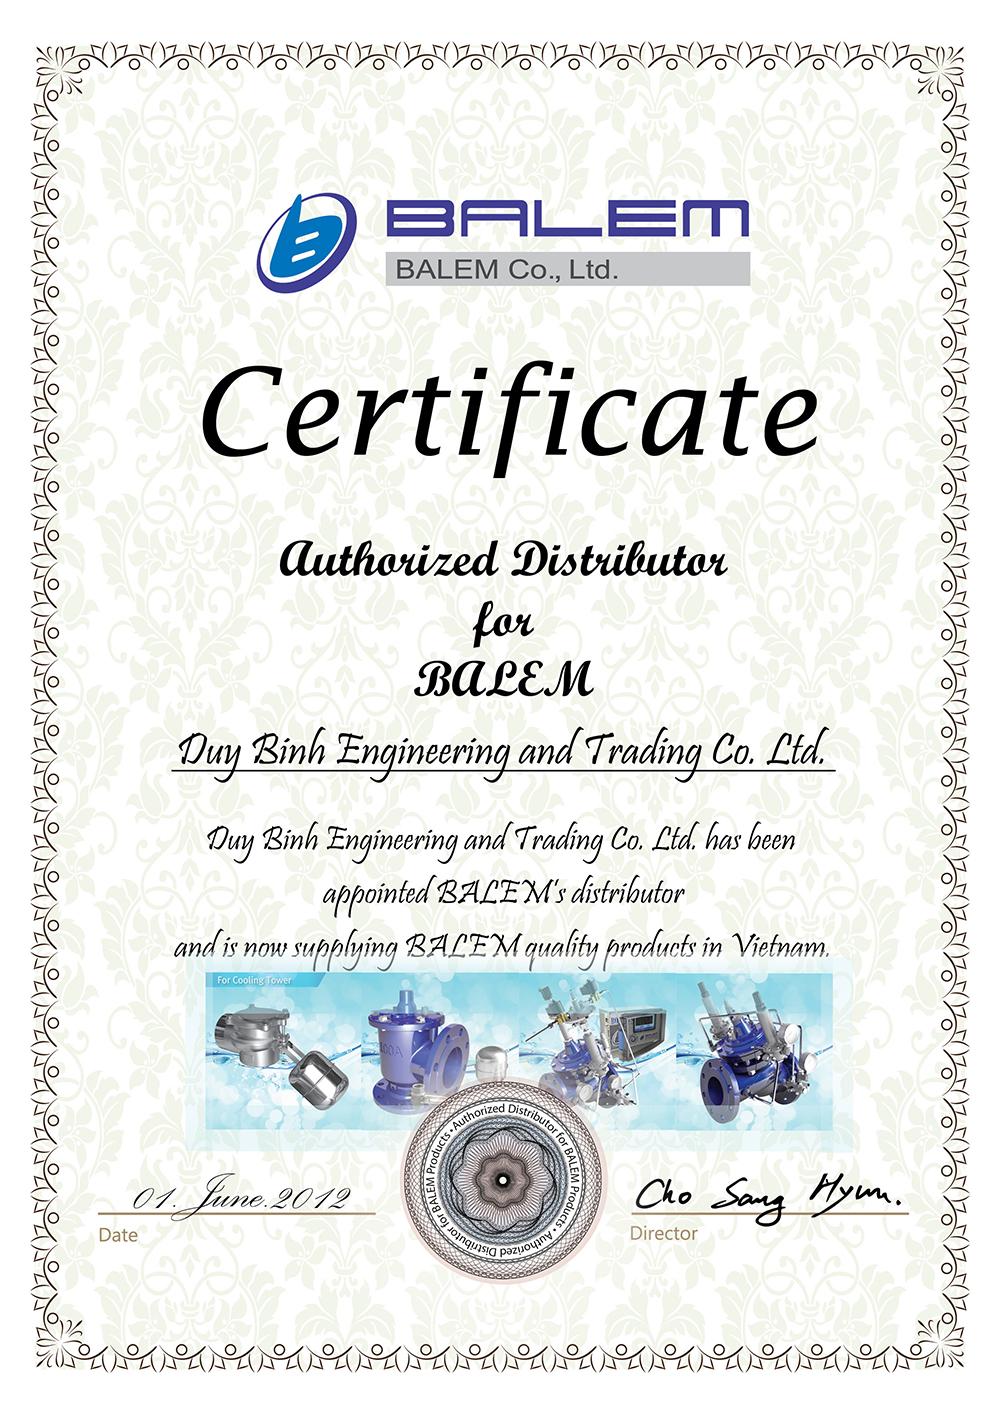 duybinh-certificate.jpg